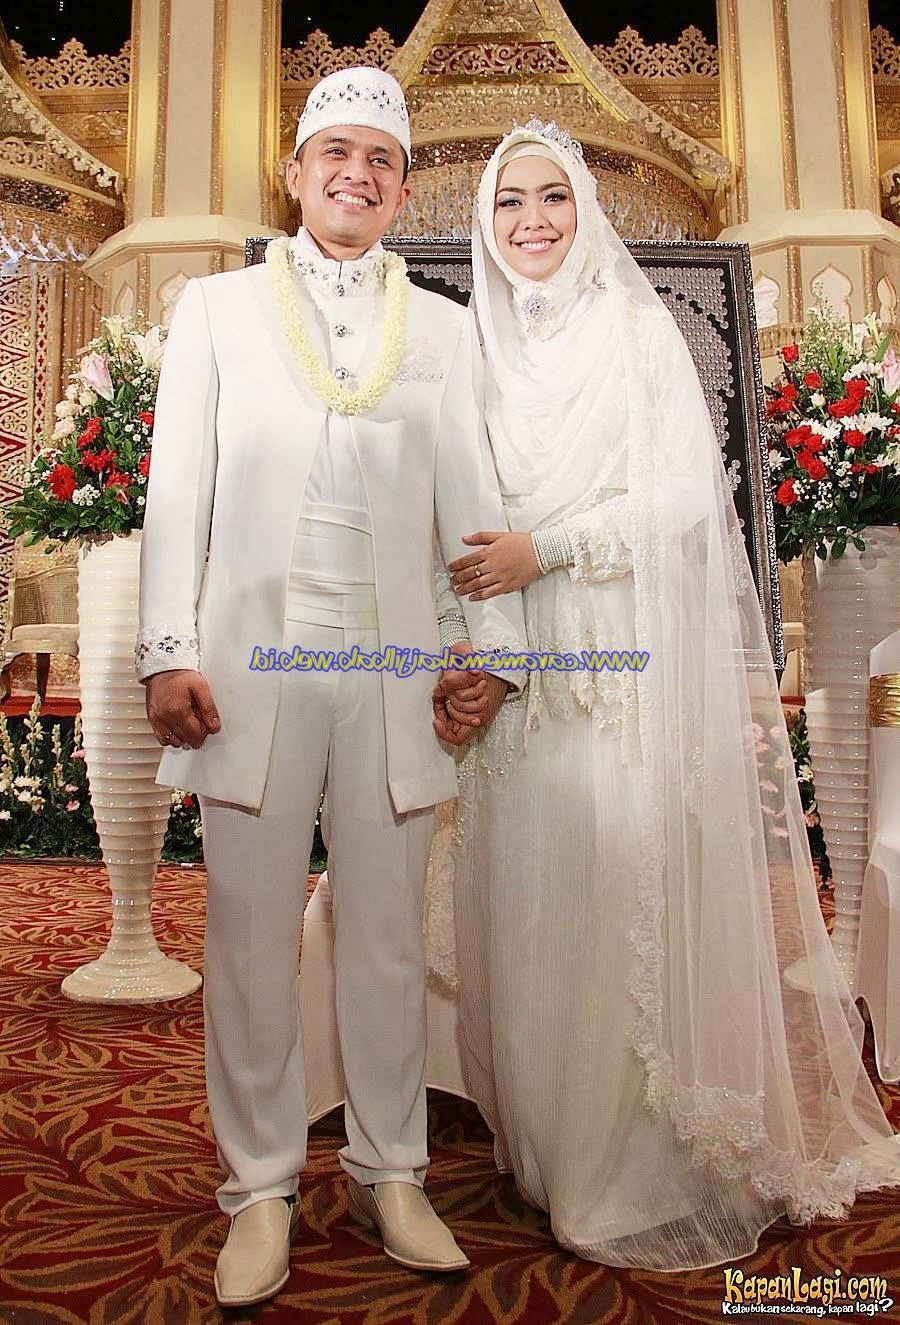 Inspirasi Busana Pengantin Muslimah Modern Tqd3 Baju Pengantin Muslimah Modern Terbaru 17